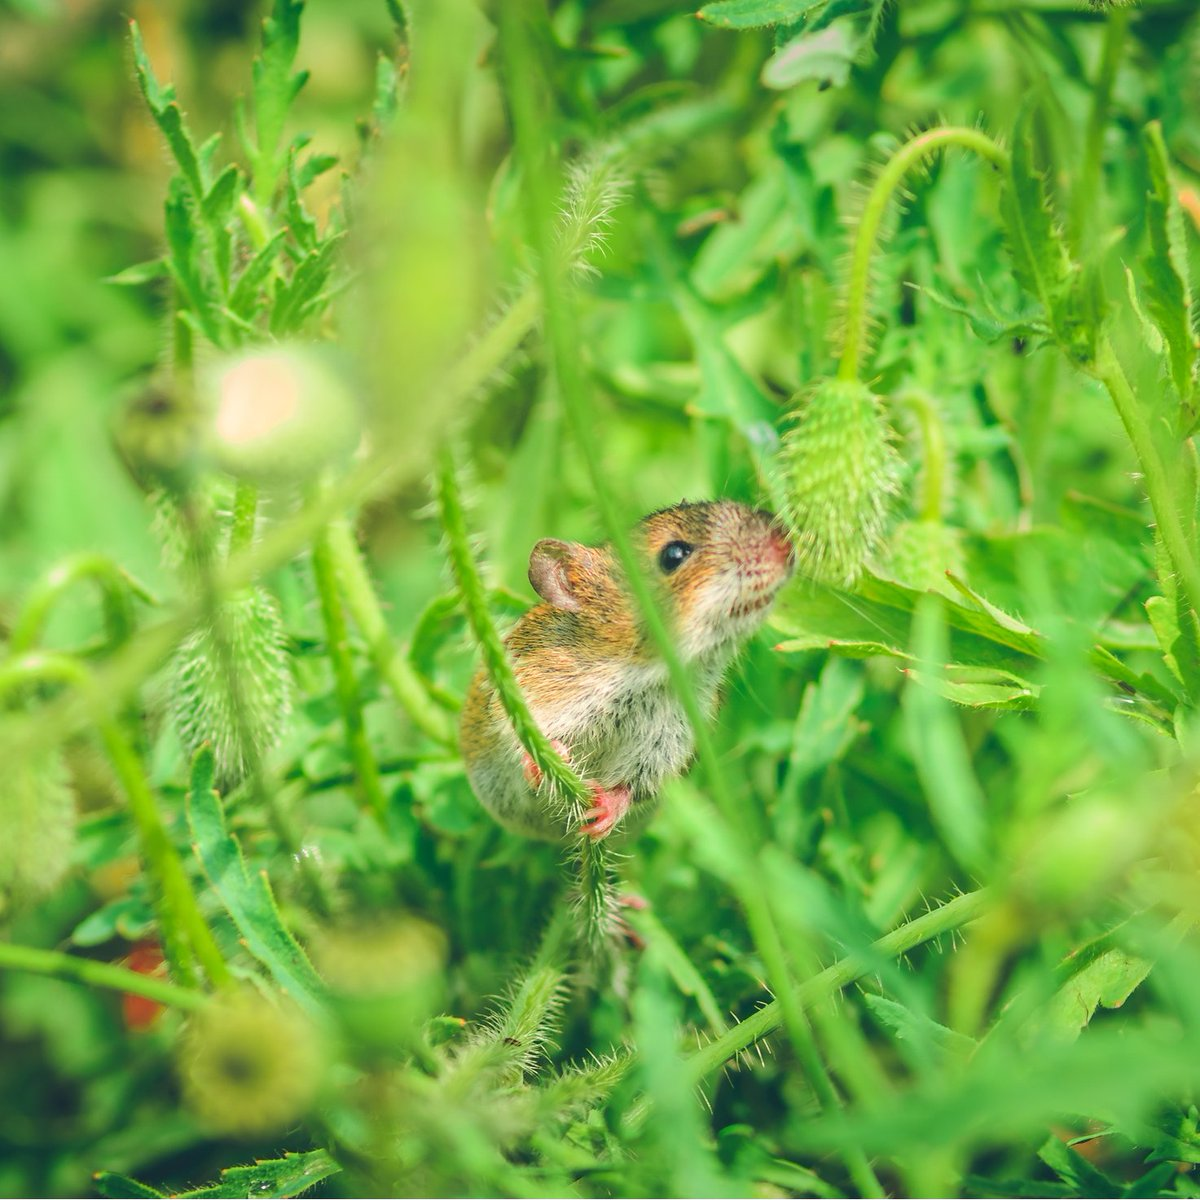 Какую траву боятся мыши и крысы?